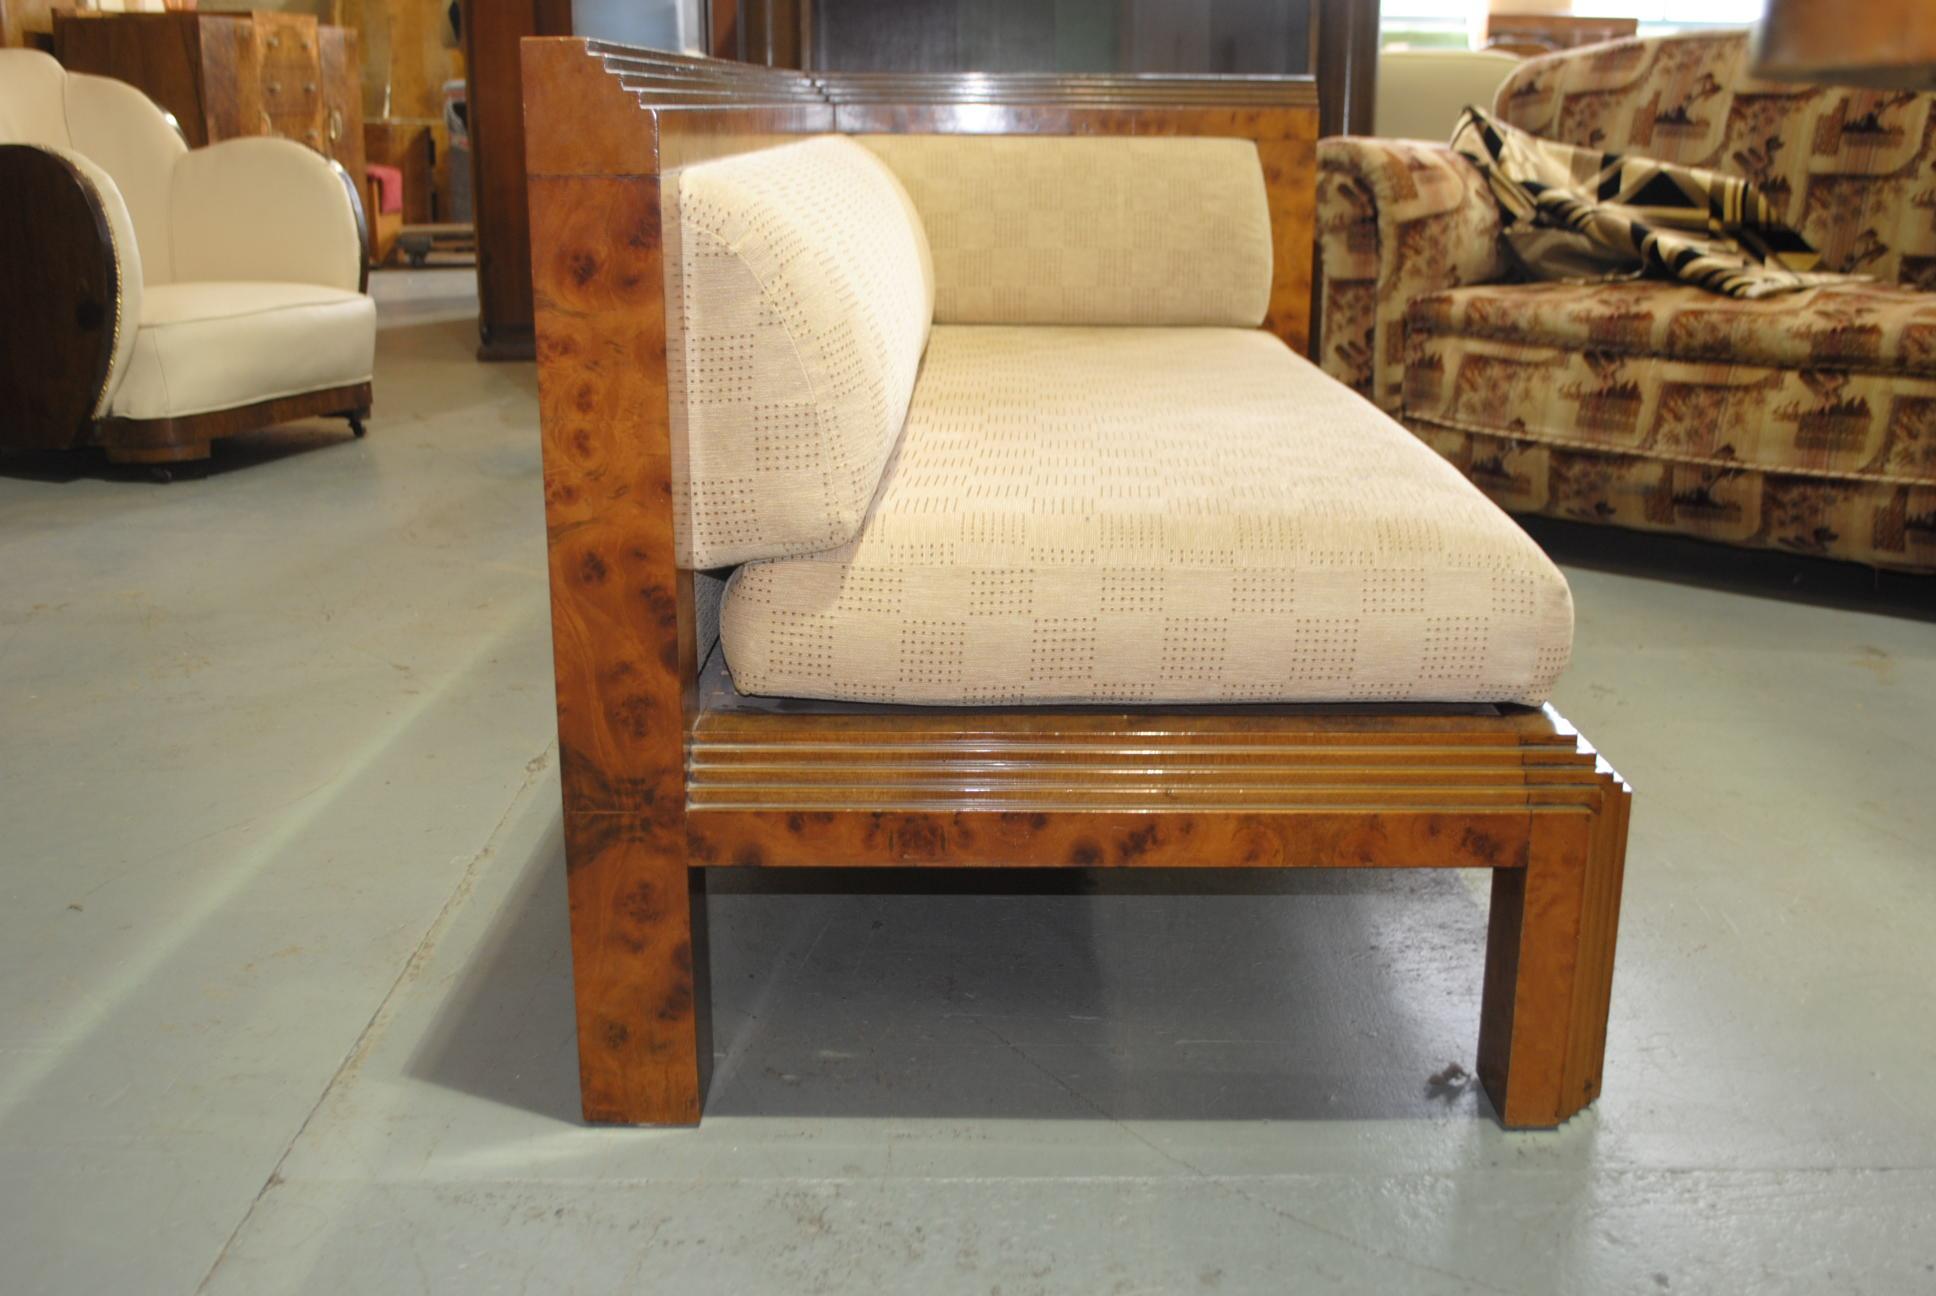 art deco chaise cloud 9 art deco furniture sales. Black Bedroom Furniture Sets. Home Design Ideas